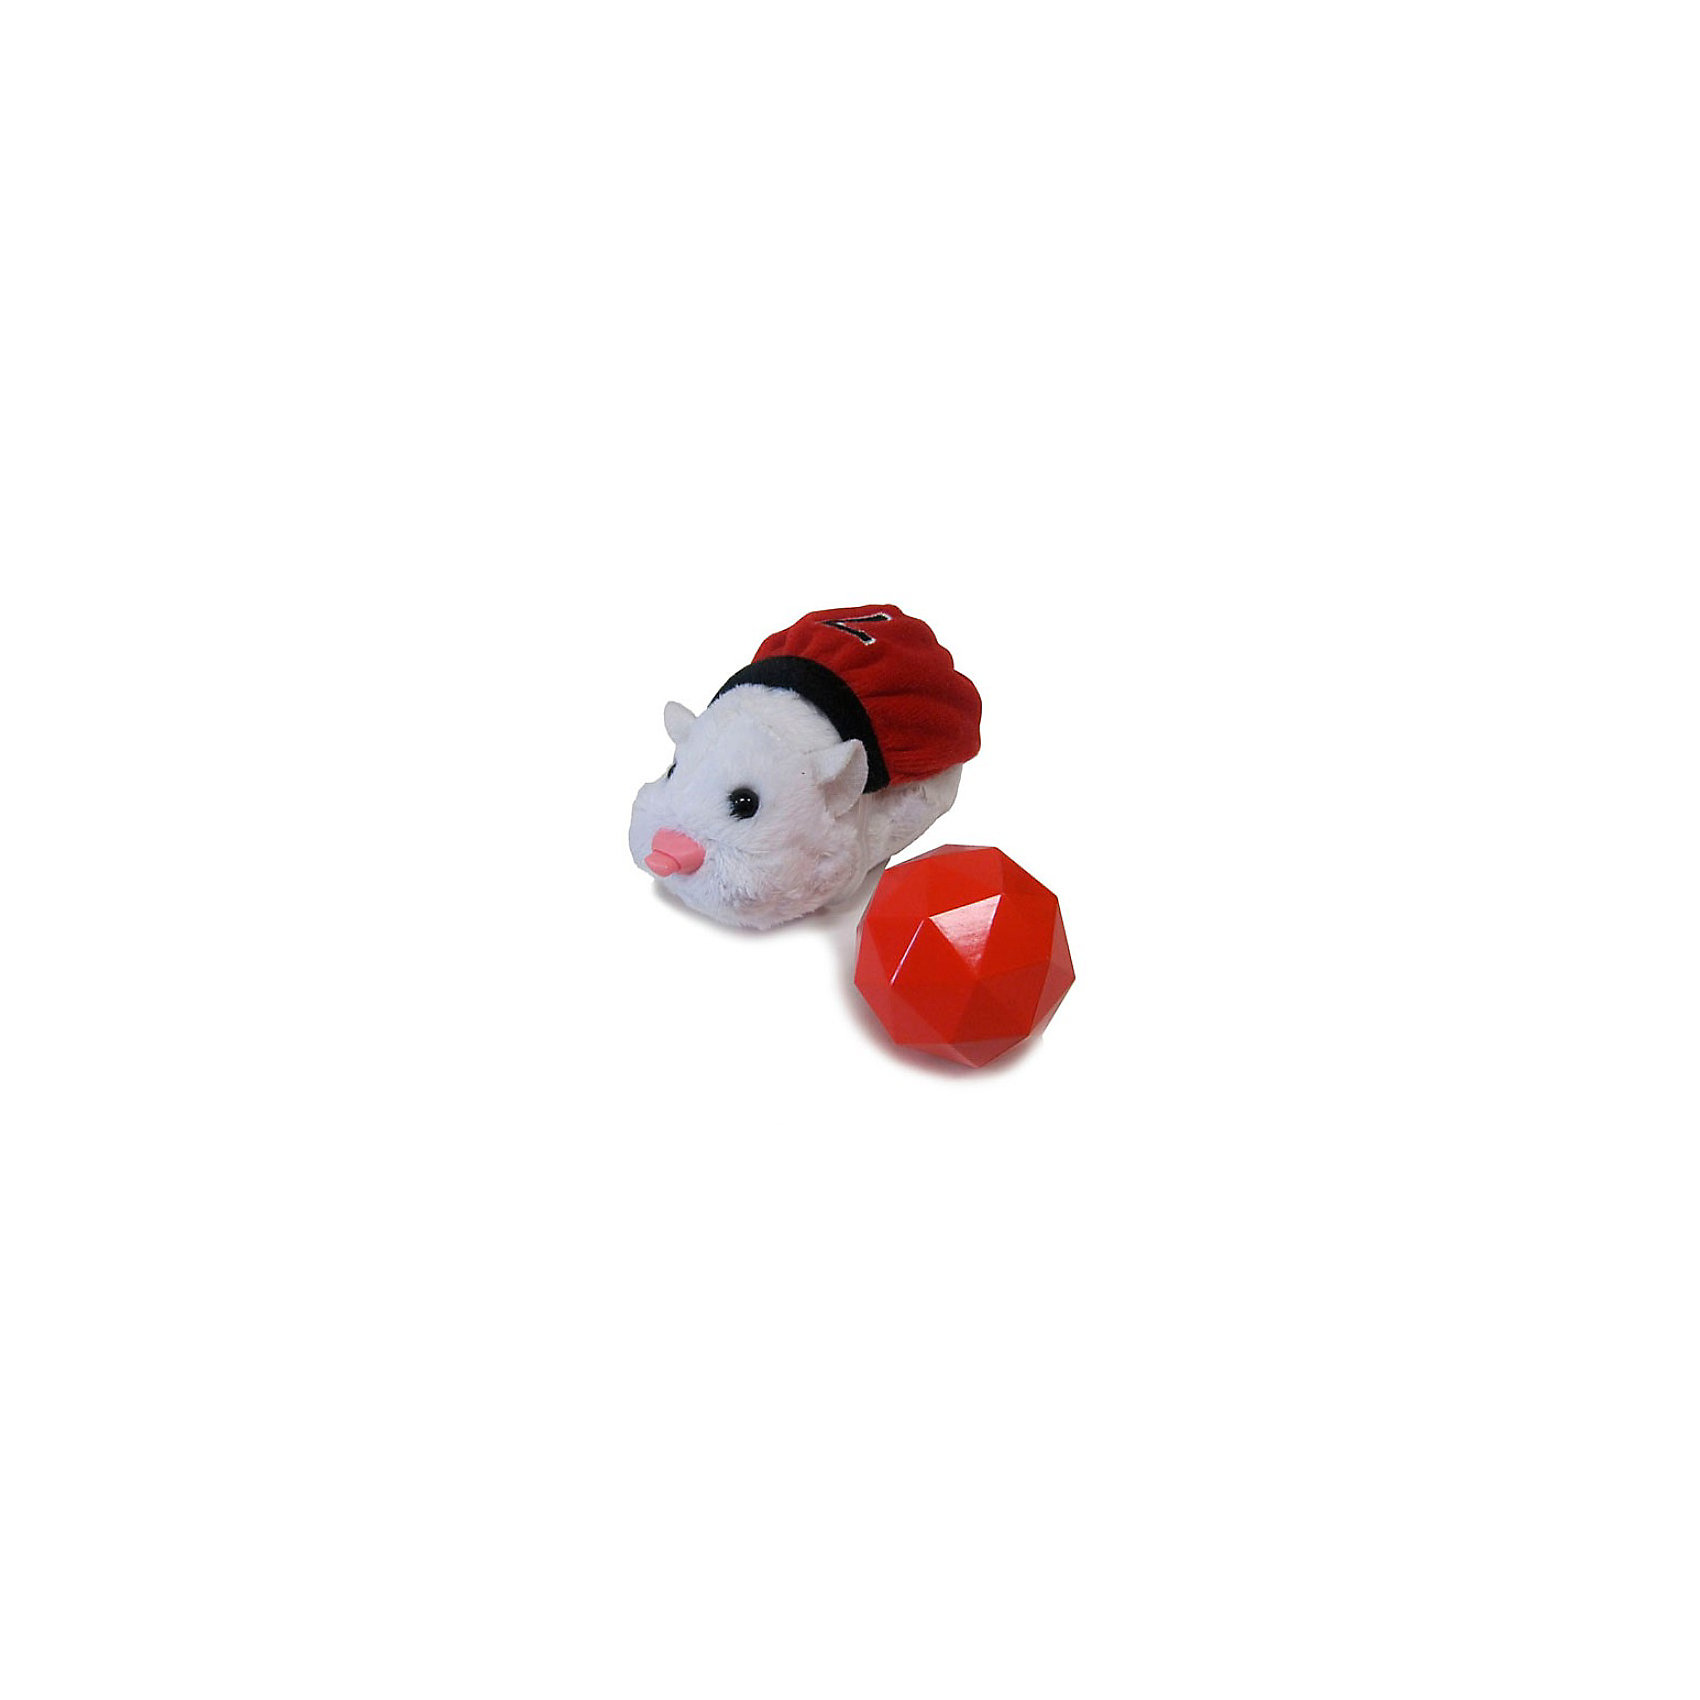 Cepia Cepia Костюм баскетболиста и мячик для хомячка Жу Жу Петс куплю маленького хомячка в одинцово